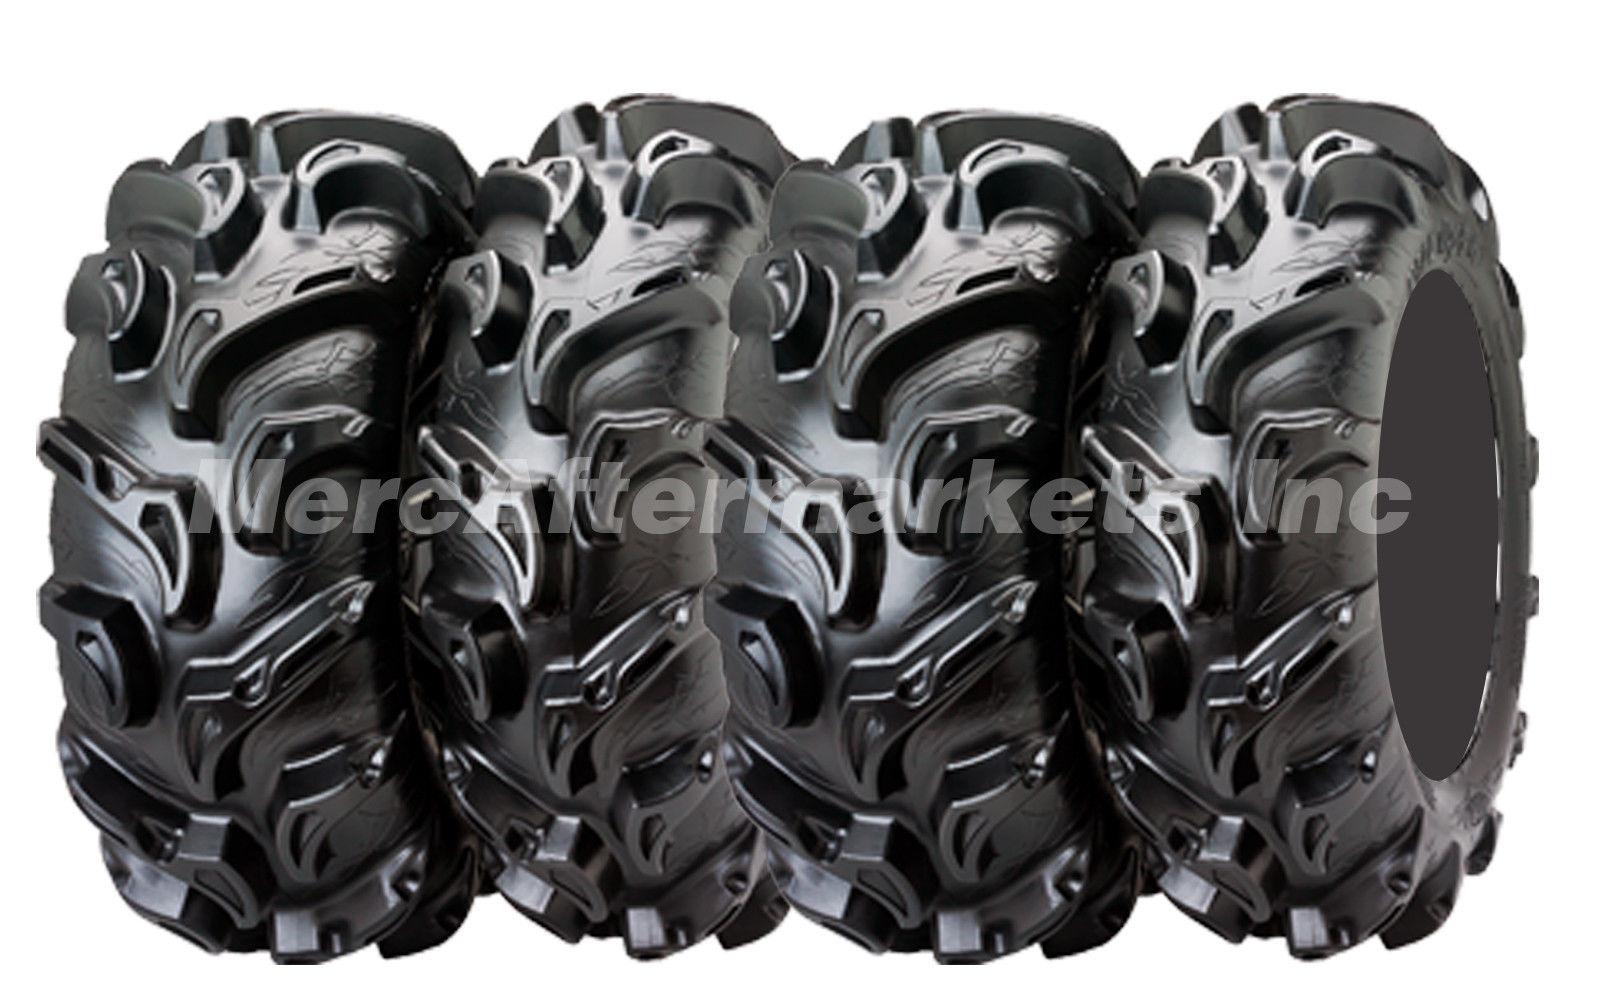 Utv Tires For Sale >> Details About Itp Mega Mayhem 28x9x12 28x11x12 Atv Utv Tires Set Of 4